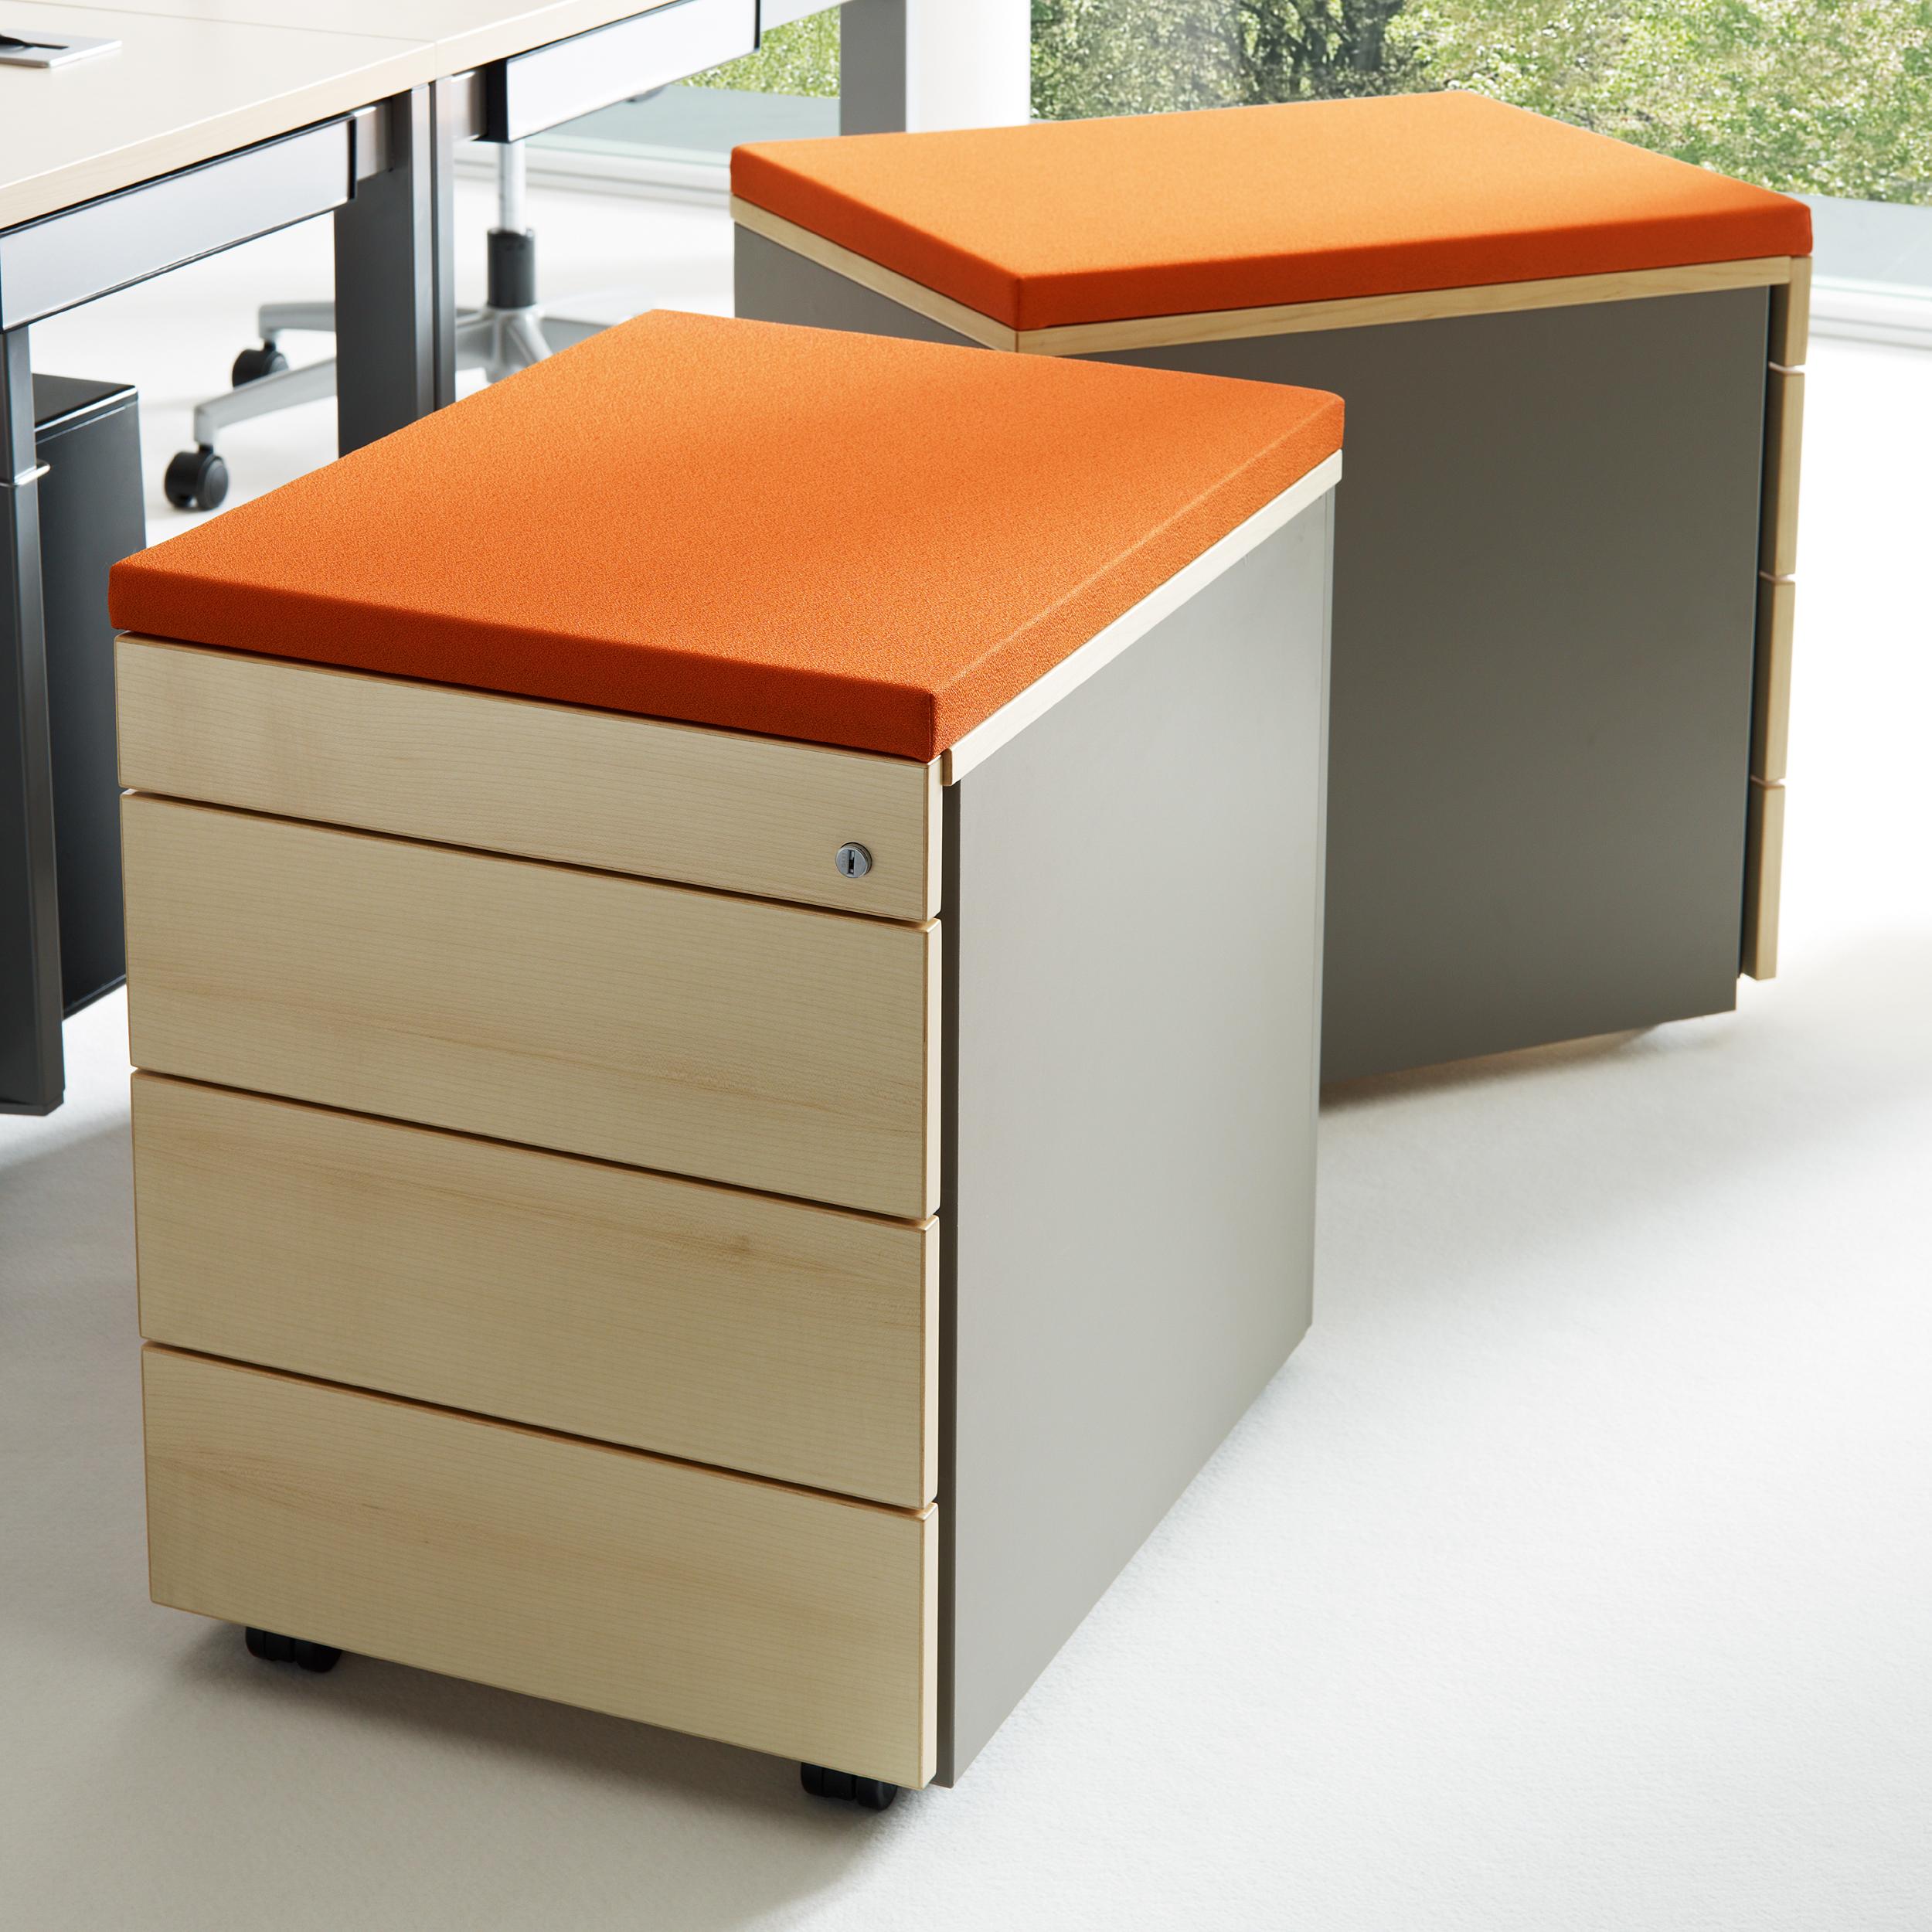 office-furniture_SQart_detail_06.jpg